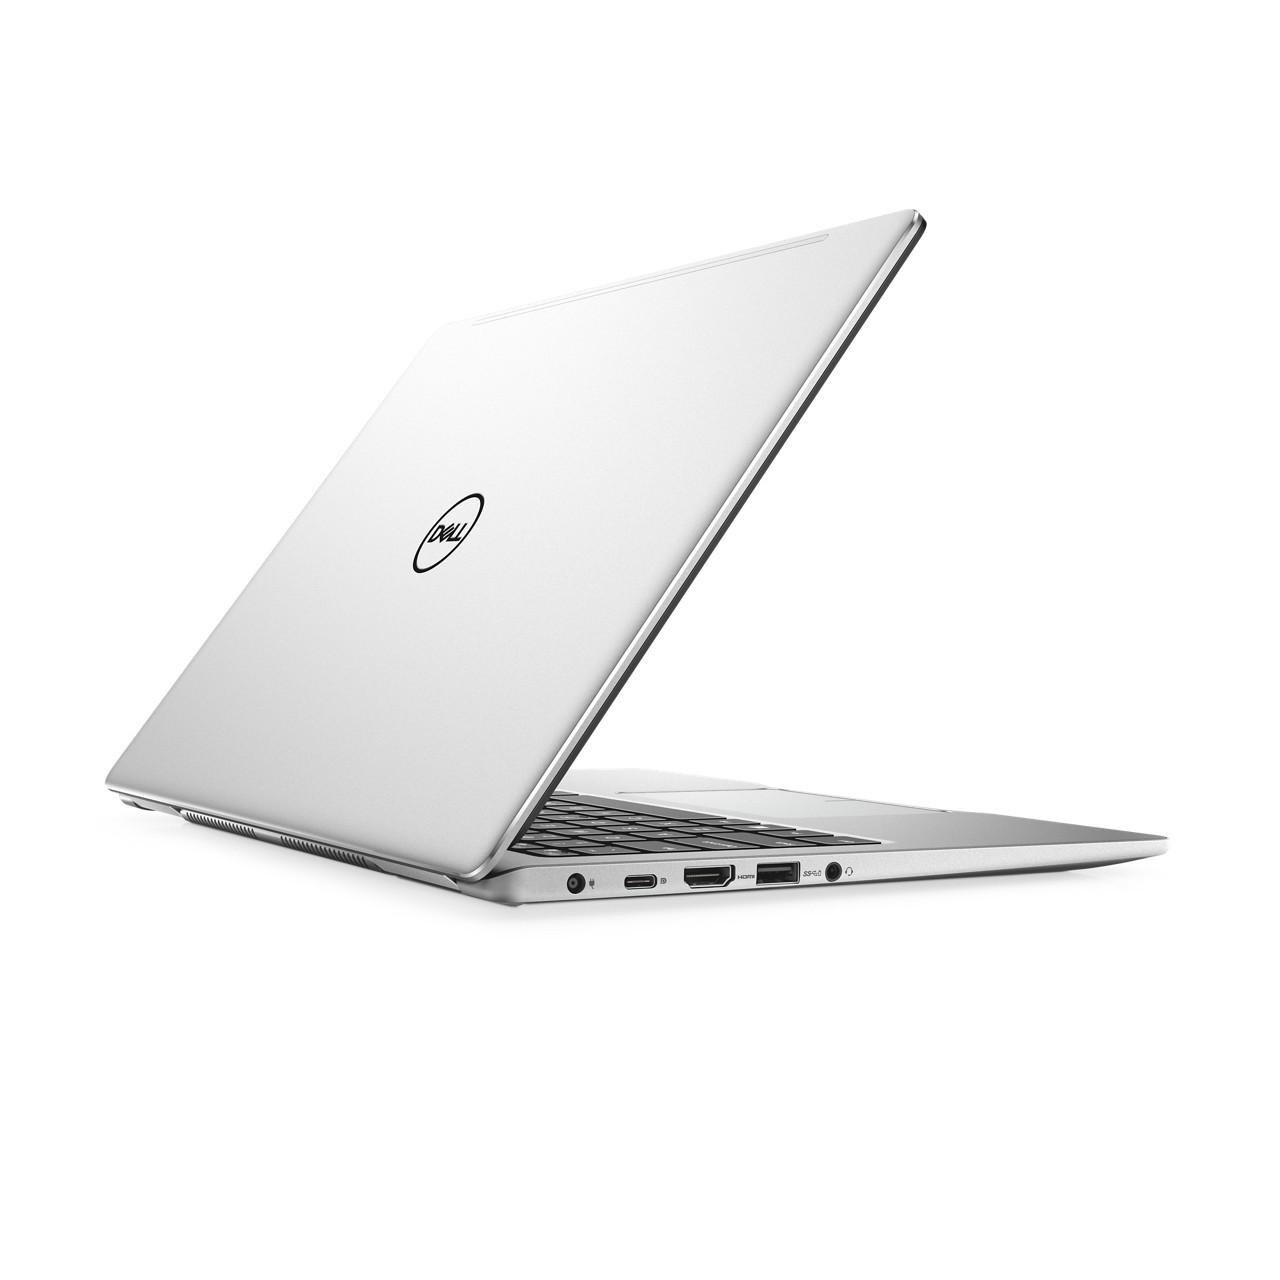 Dell Inspiron 13 7000, i7370-5725SLV, 13.3'' FHD (1920 x 1080), Intel Core i5-8250U, 8GB 2400MHz DDR4, 256 GB (SSD), Intel UHD Graphics 620 PRICE VARIES IN-STORE! Walmart *B&M YMMV